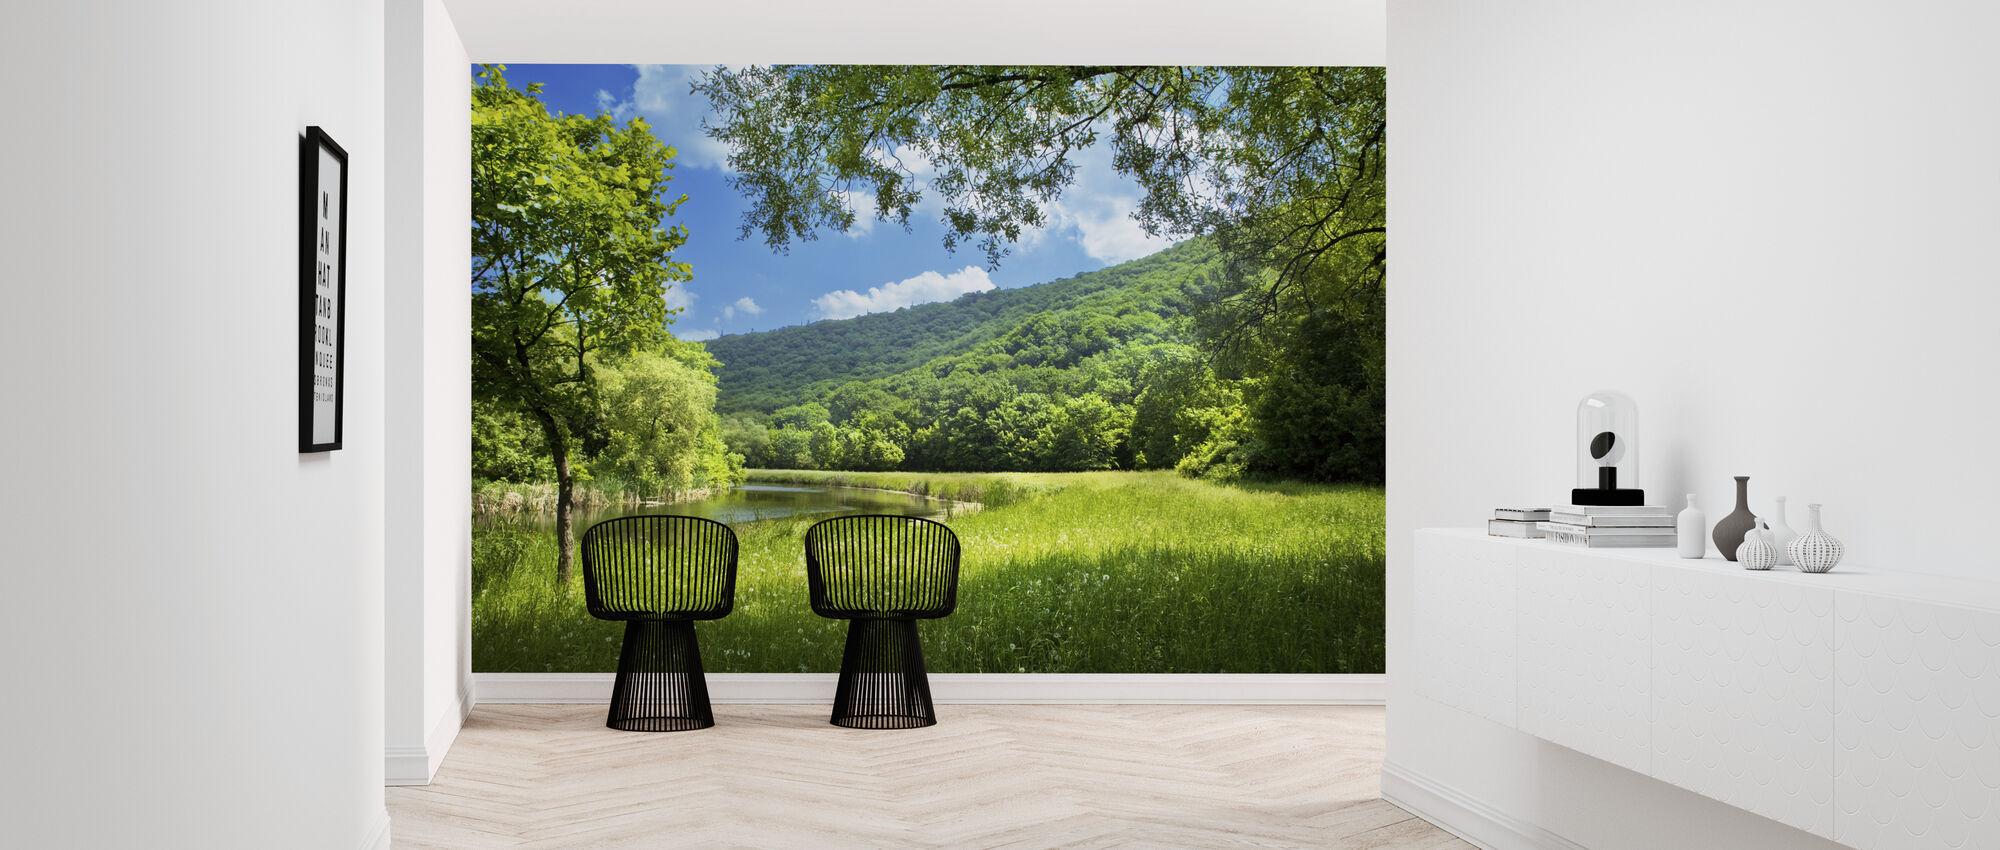 Summer Landscape with River - Wallpaper - Hallway